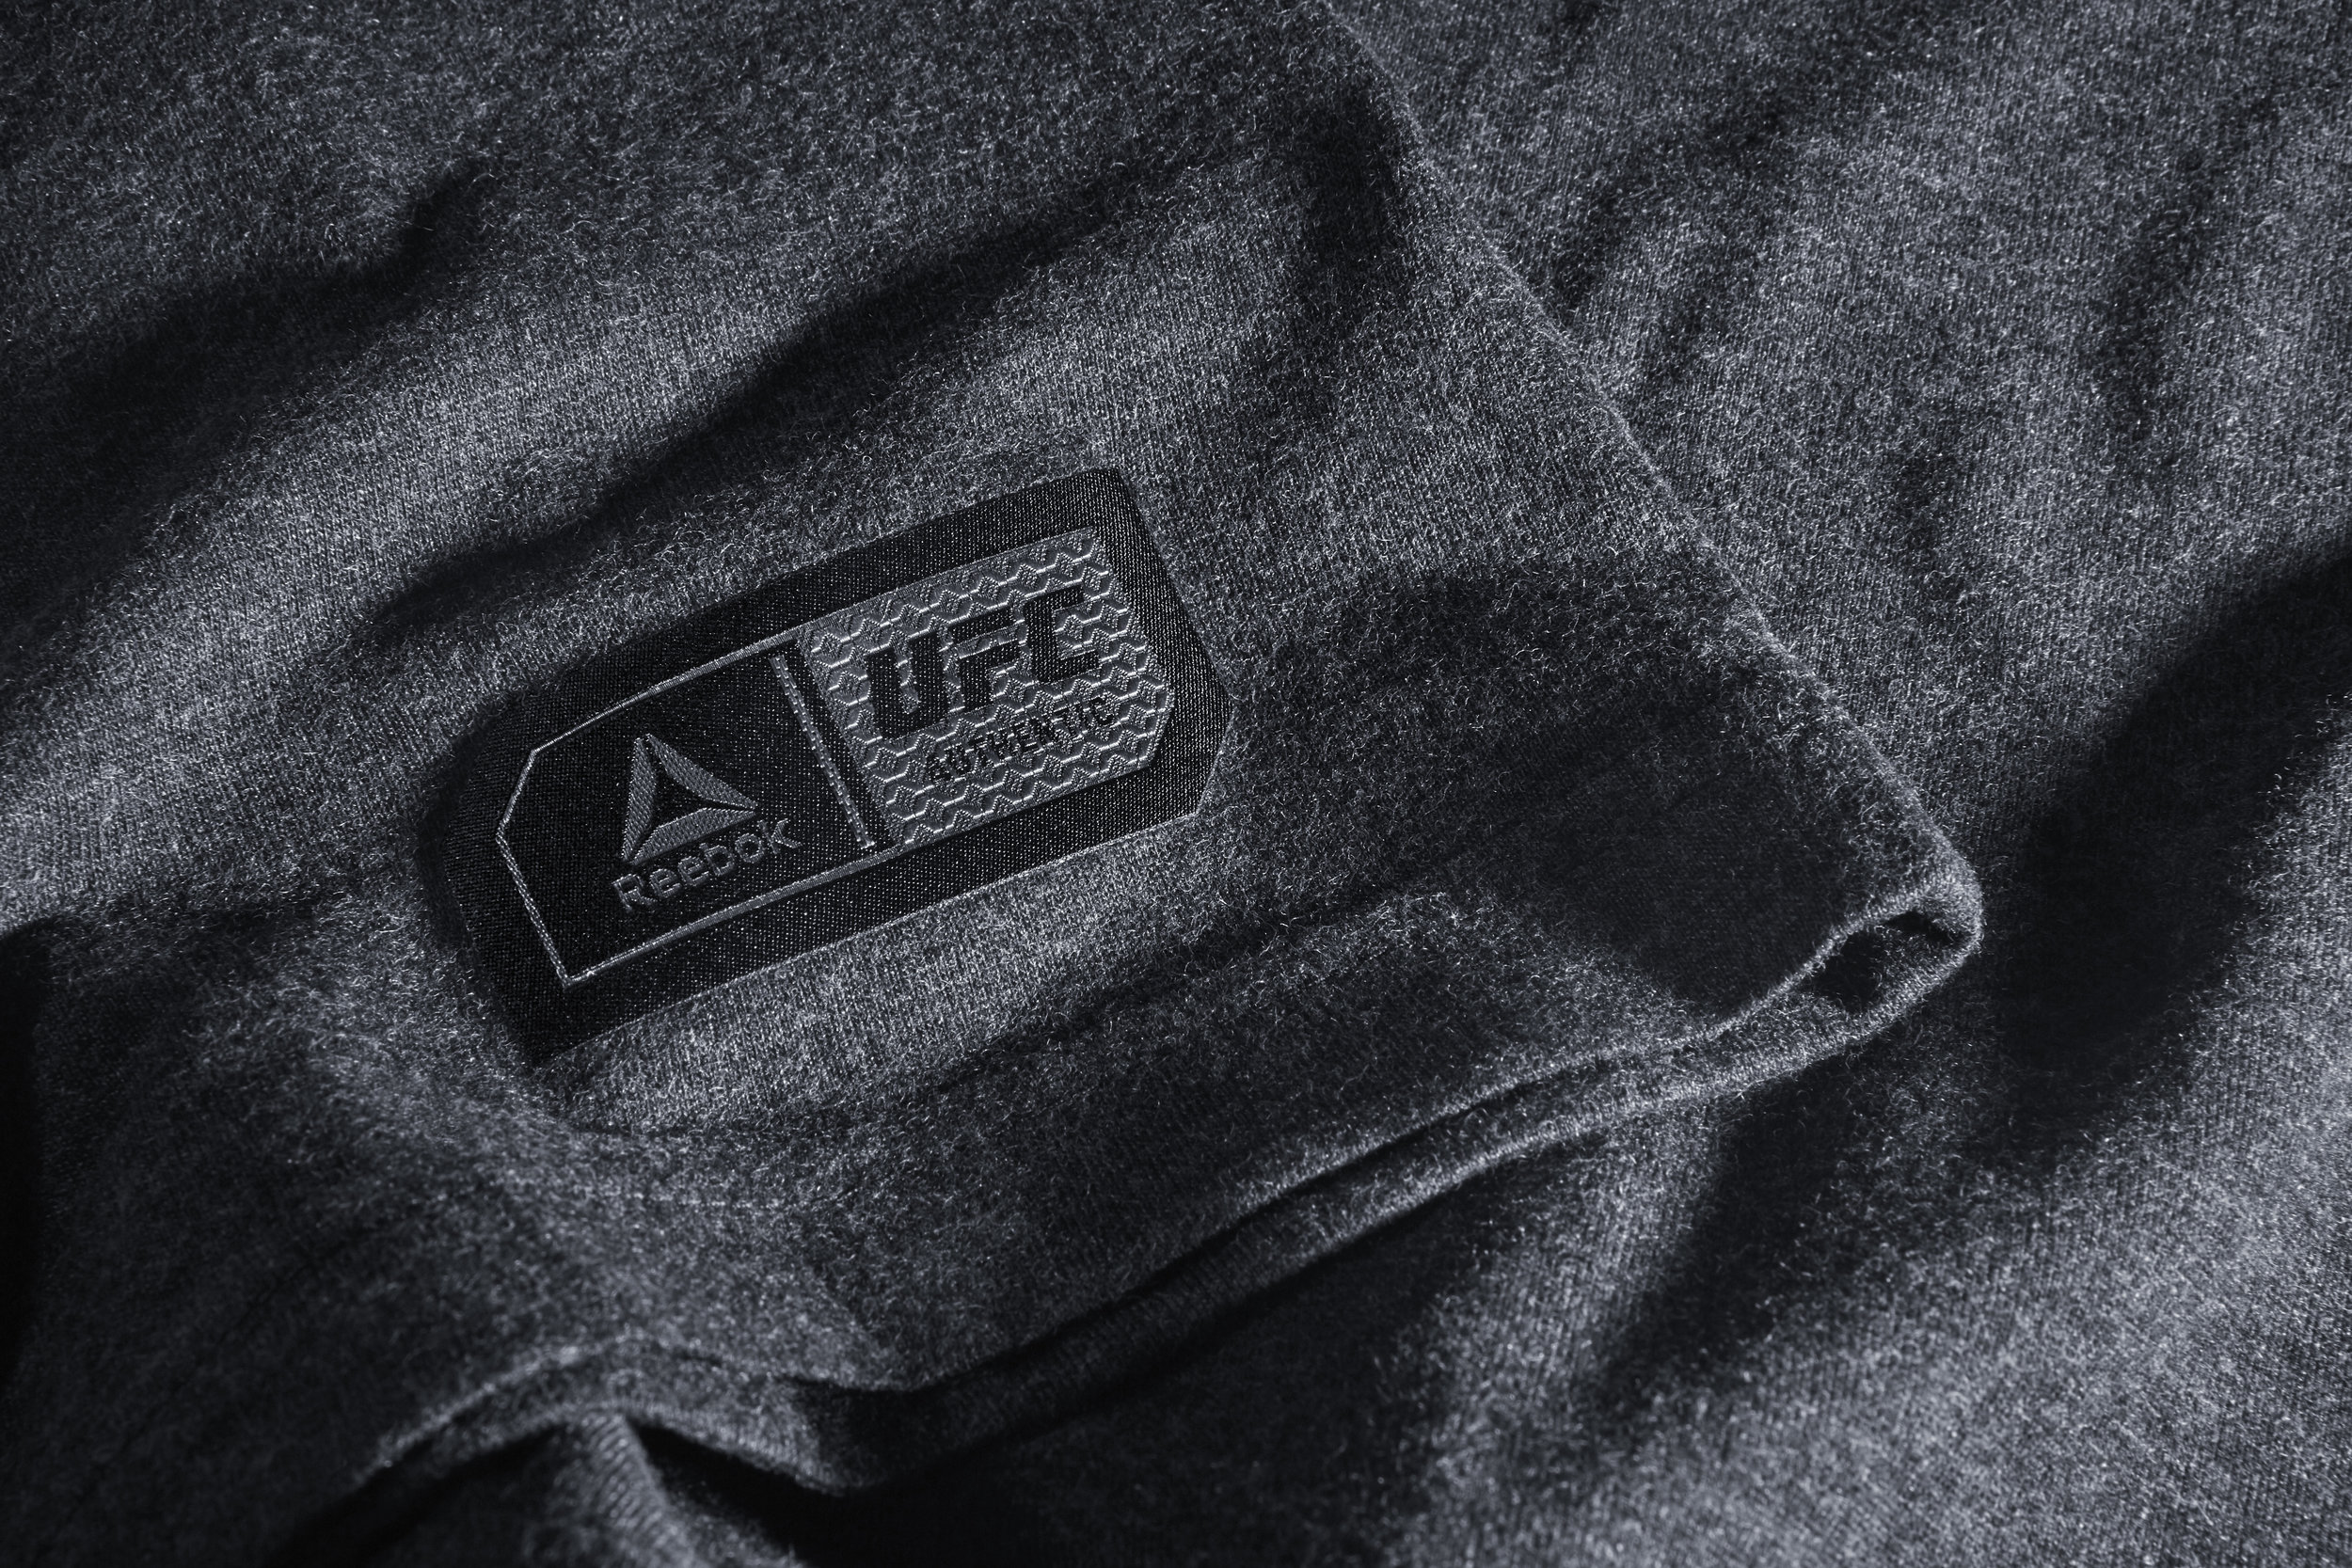 C21101_FW17_UFC_FNC_Tee_Black_Label_Detail.jpg